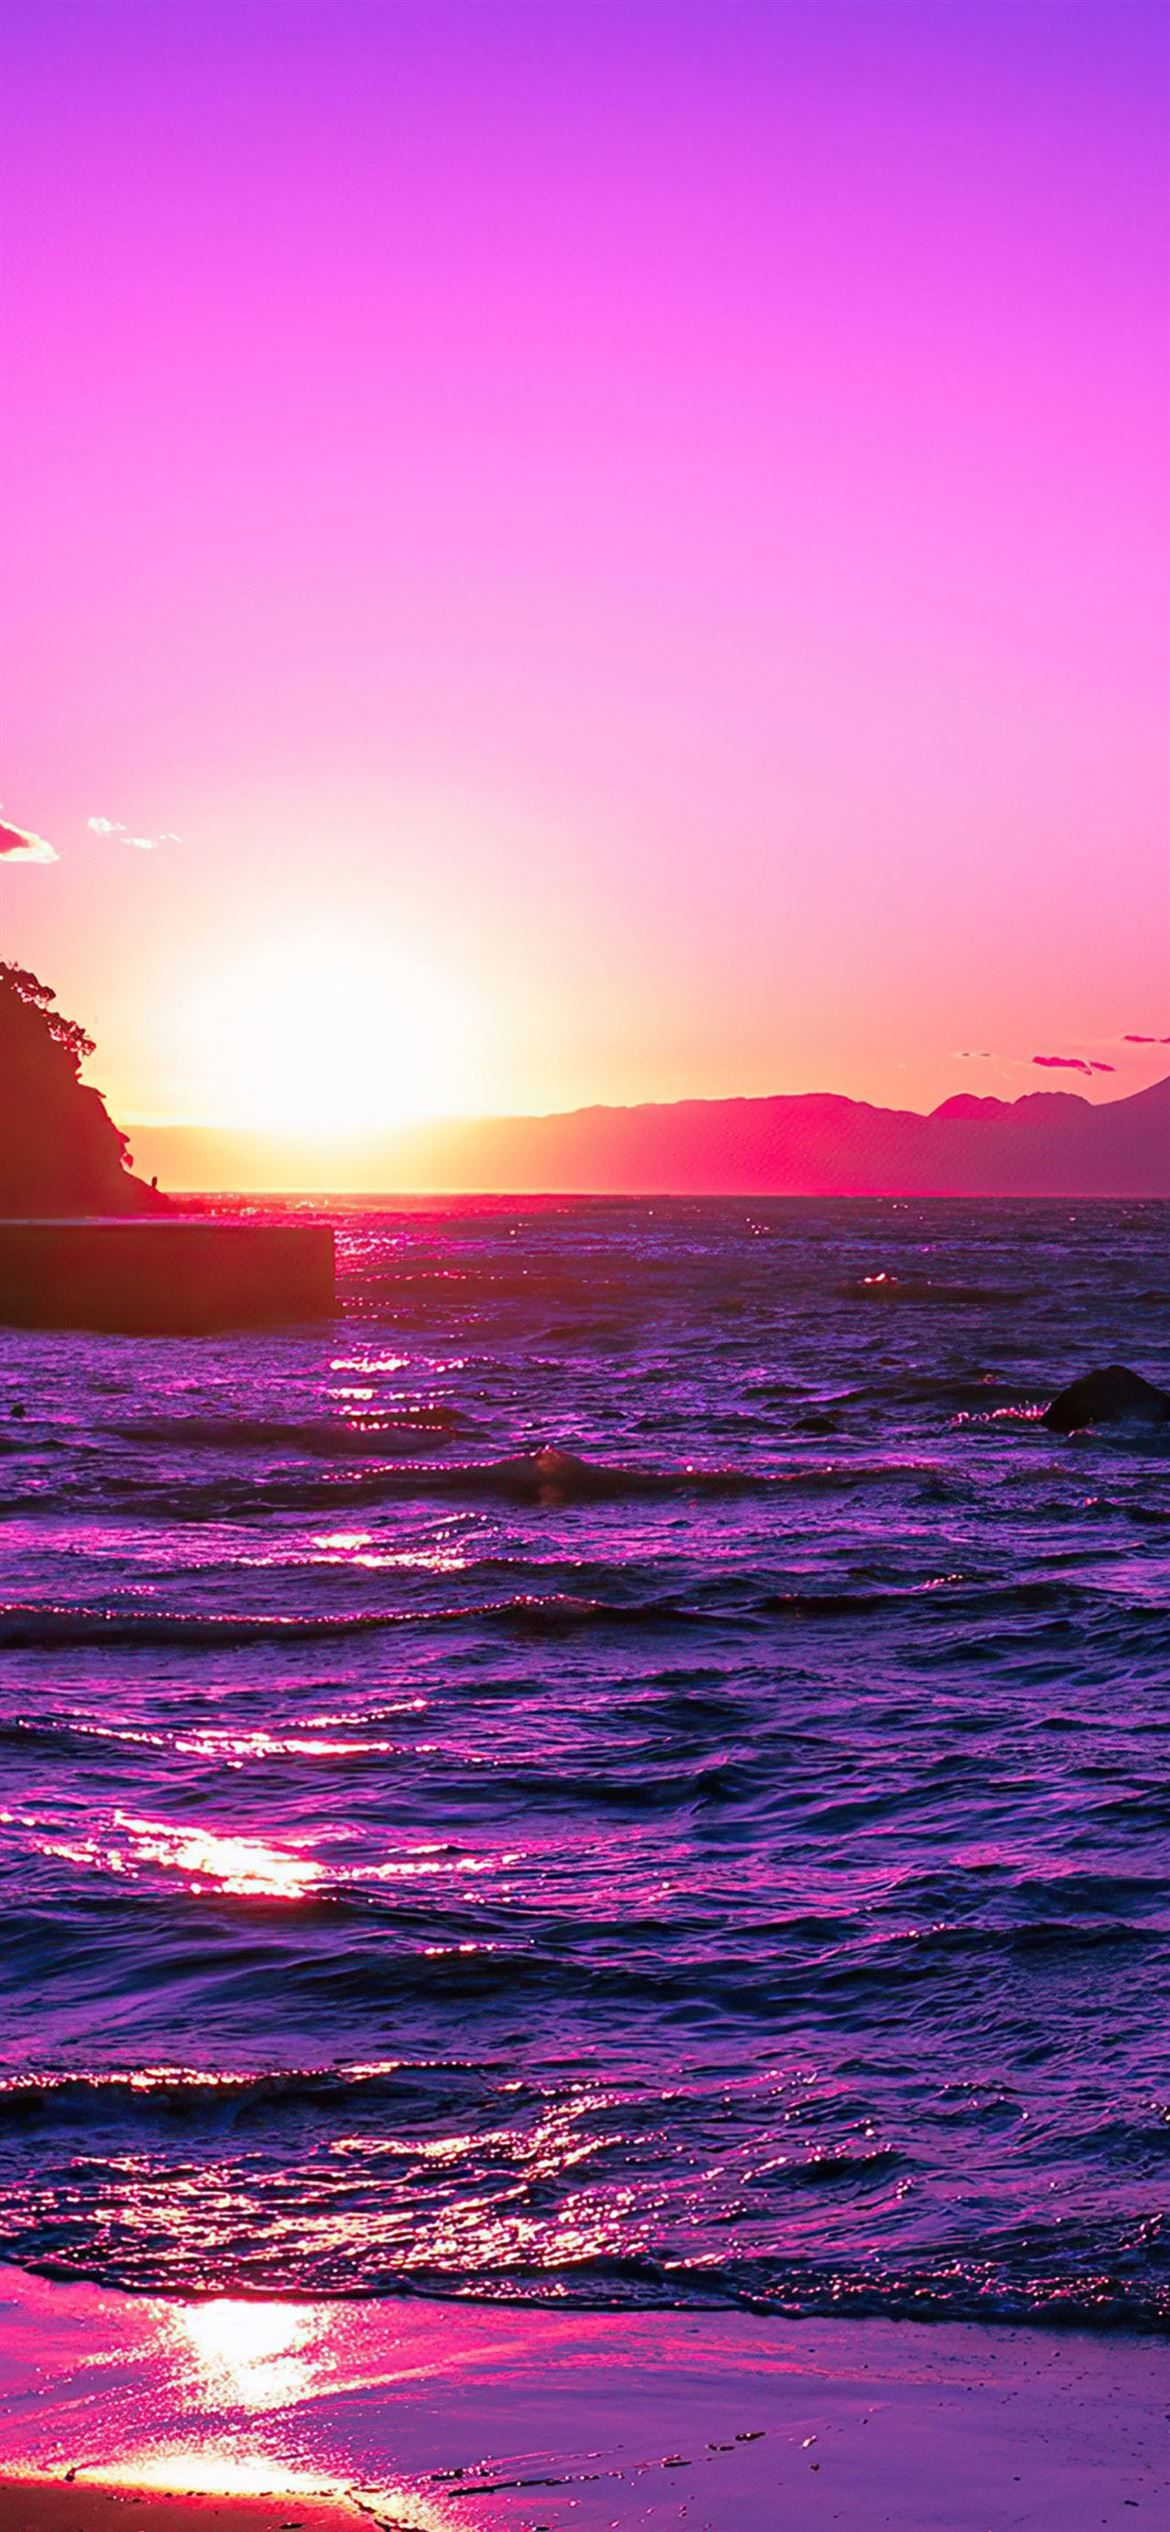 Beautiful Evening Purple Sunset 4k Sunset Evening Nature 4k Purple Sunset Cool Backgrounds Sunset Wallpaper Evening beach scenery wallpaper